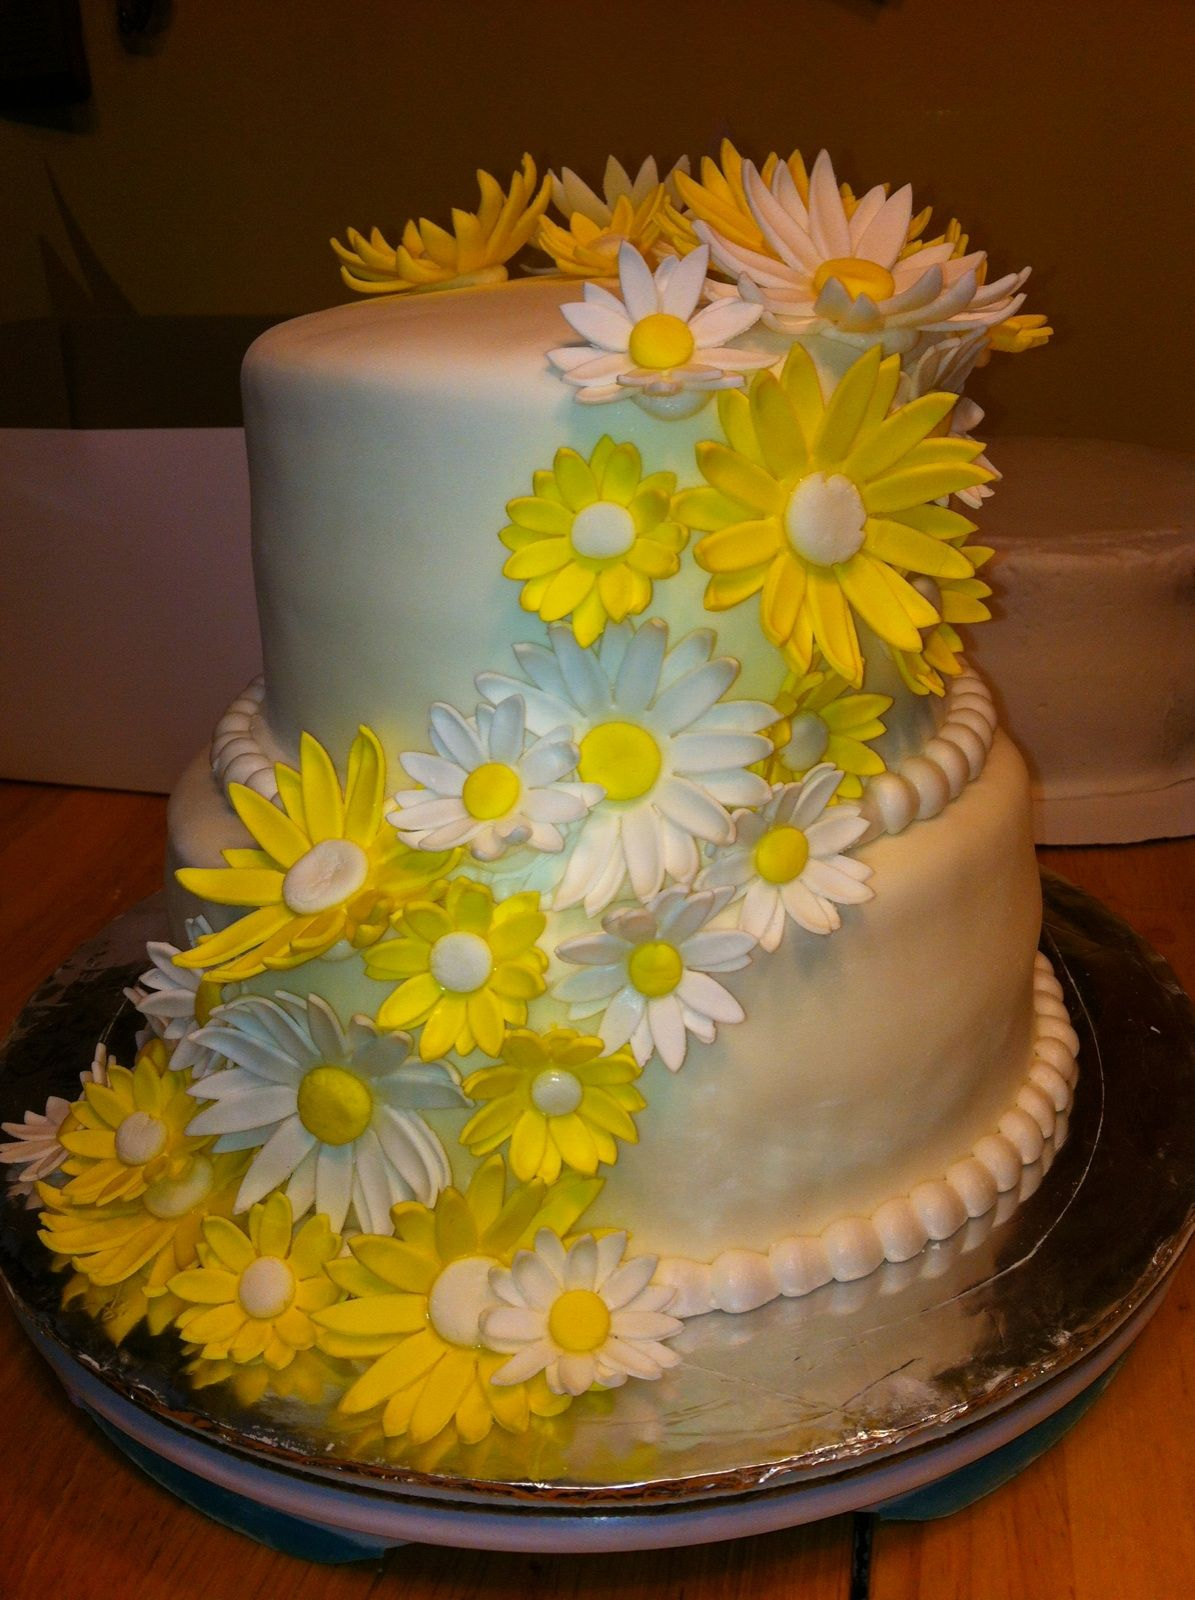 50th wedding anniversary | Cake Diva cakes | Pinterest | Wedding ...